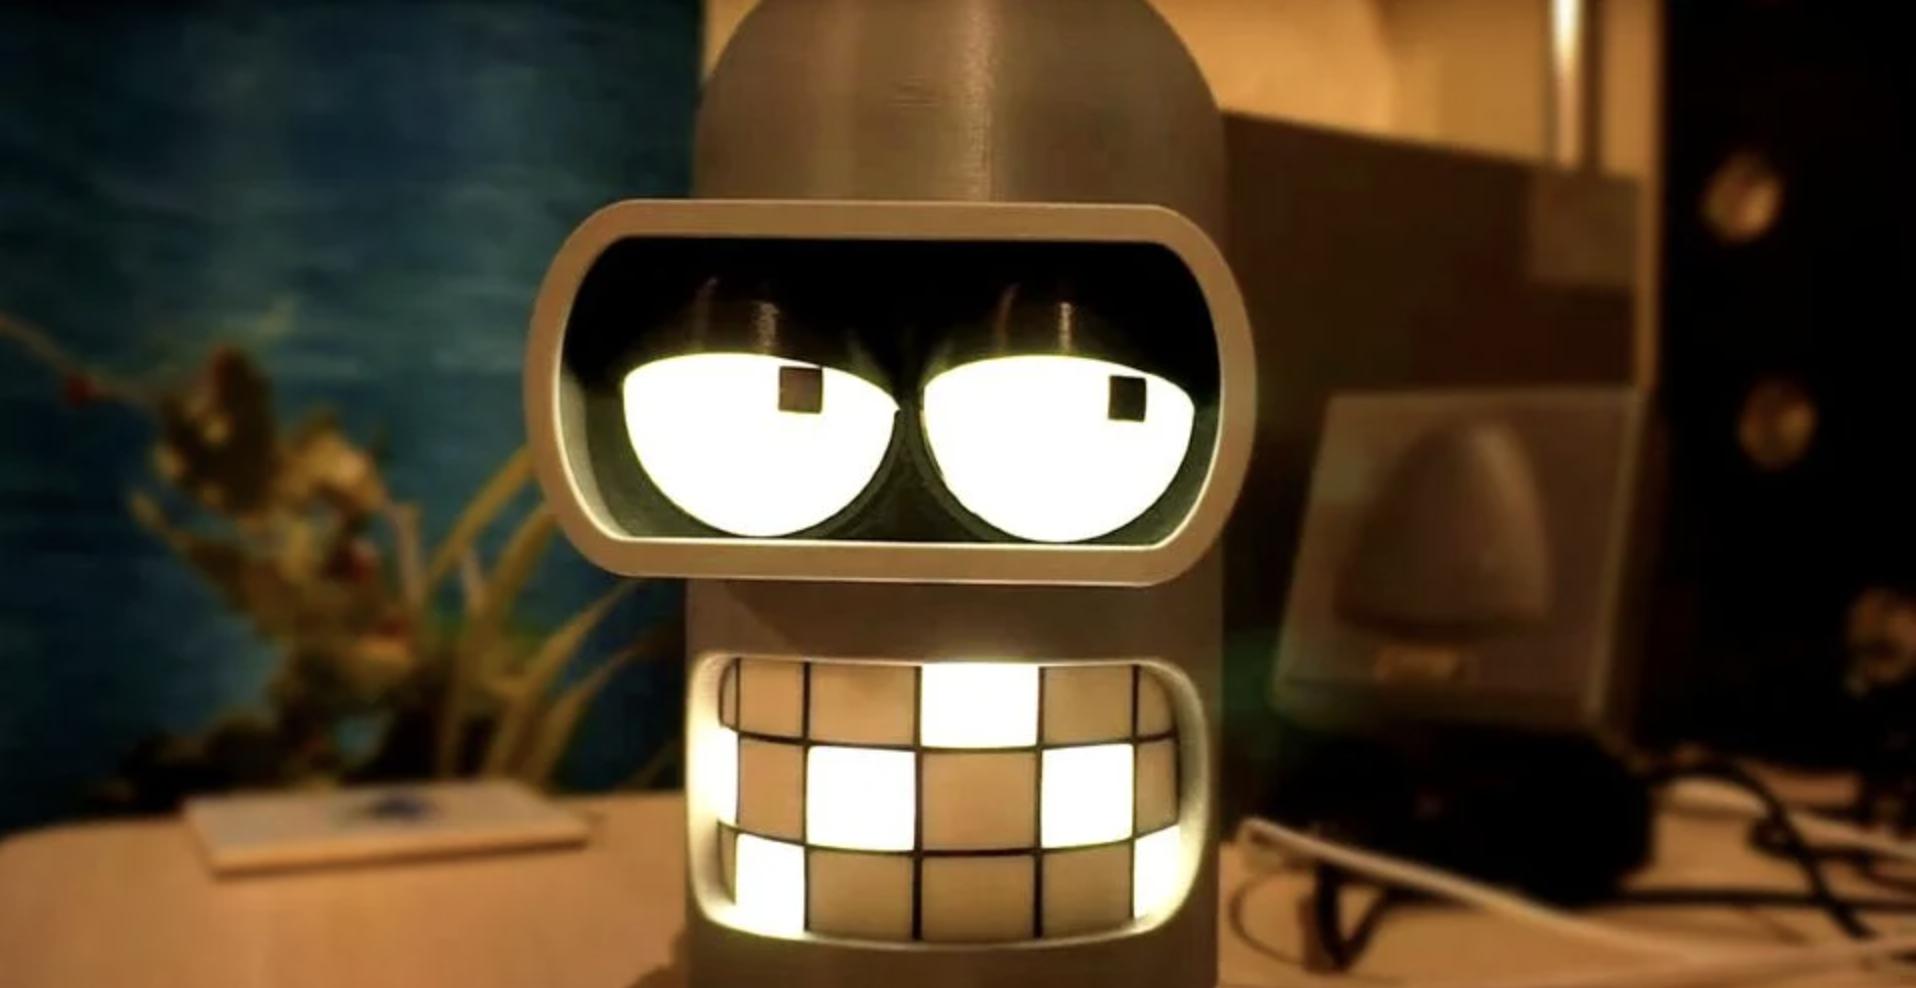 'Futurama': un fan diseña un altavoz interactivo de Bender